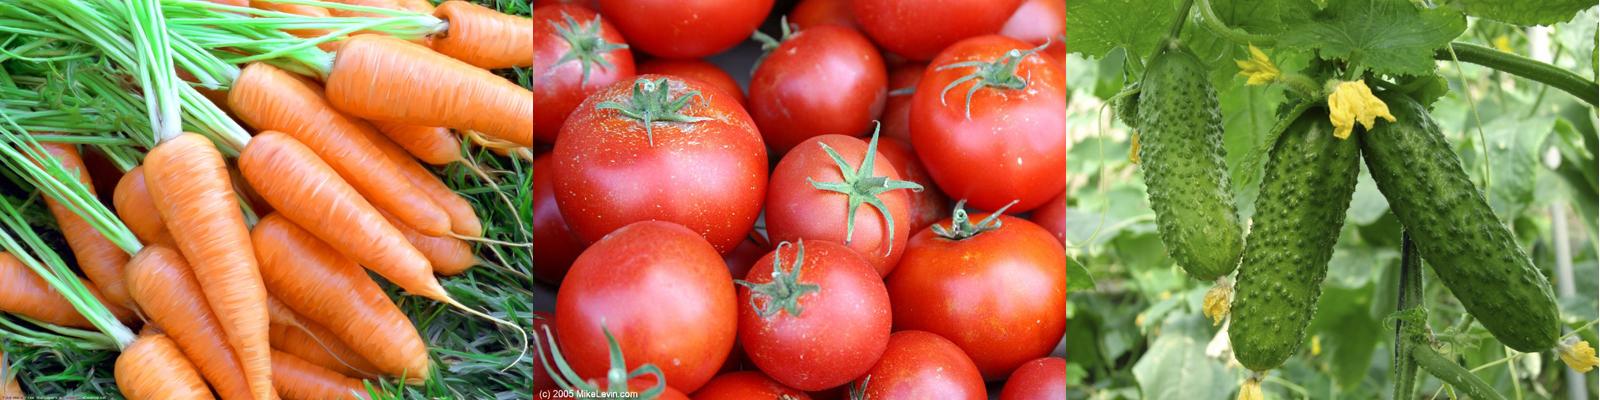 томат, морковь, огурцы